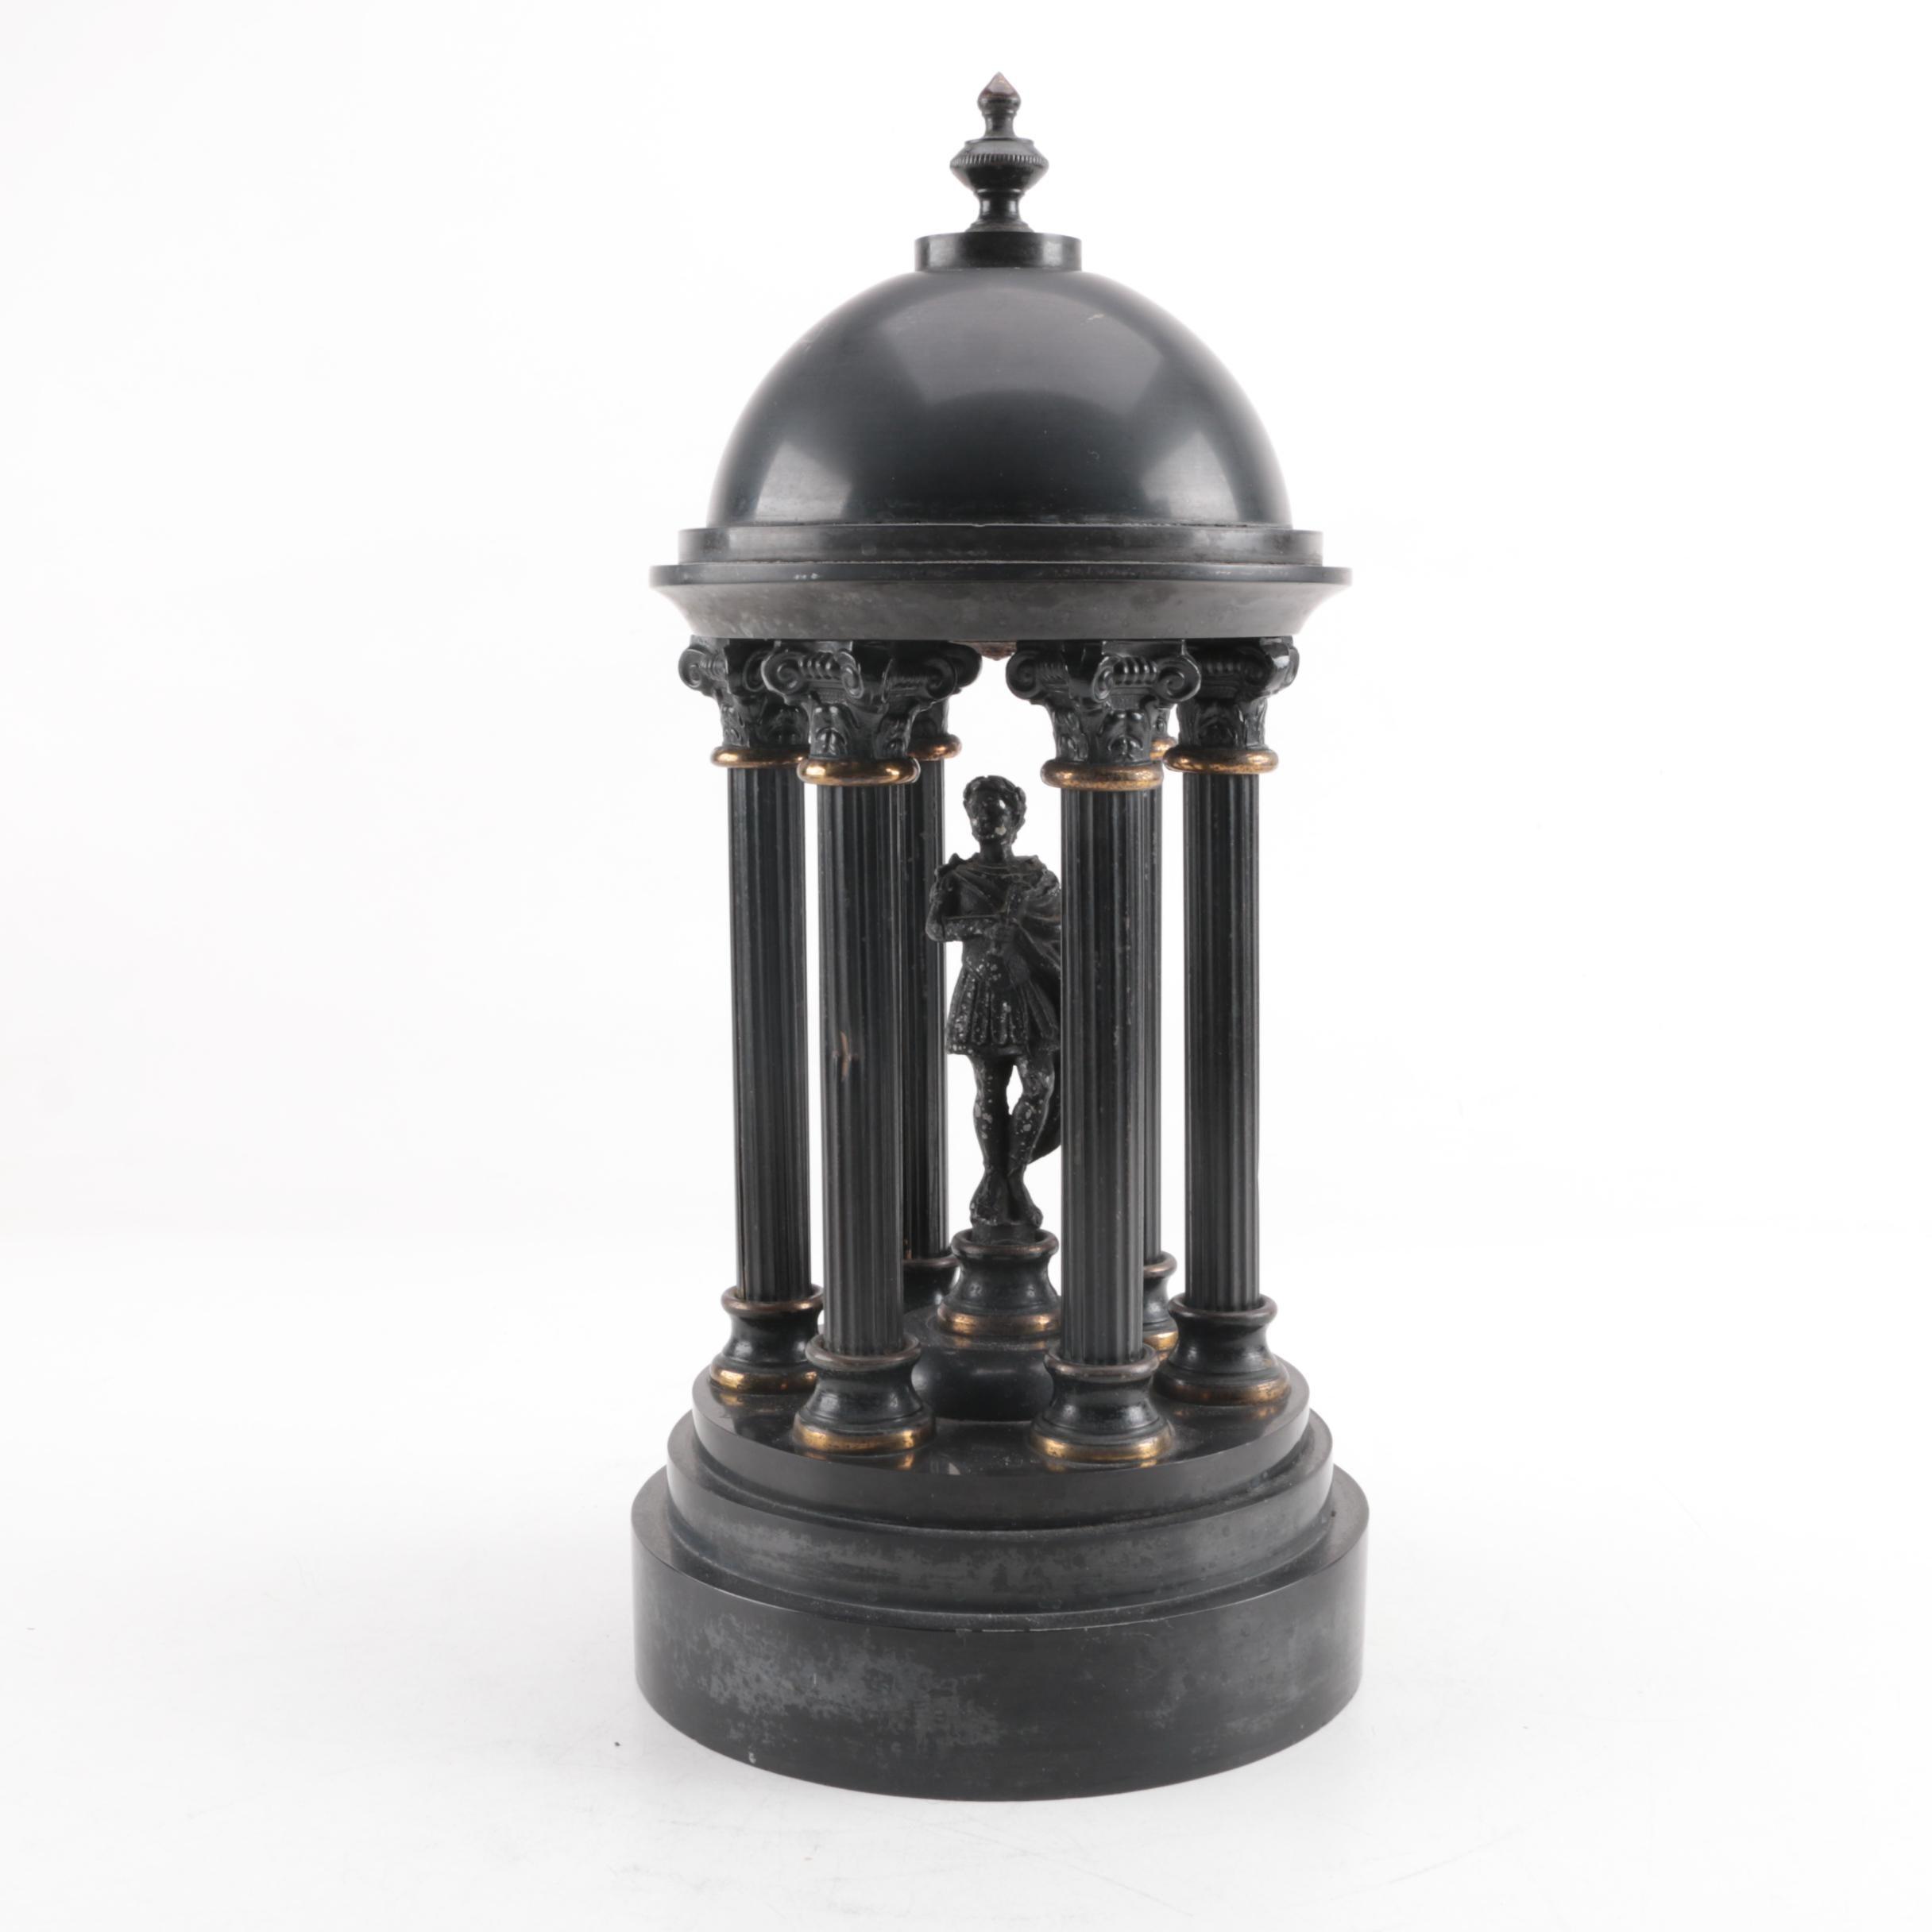 Neoclassical Style Rotunda with Roman Soldier Metal Figurine